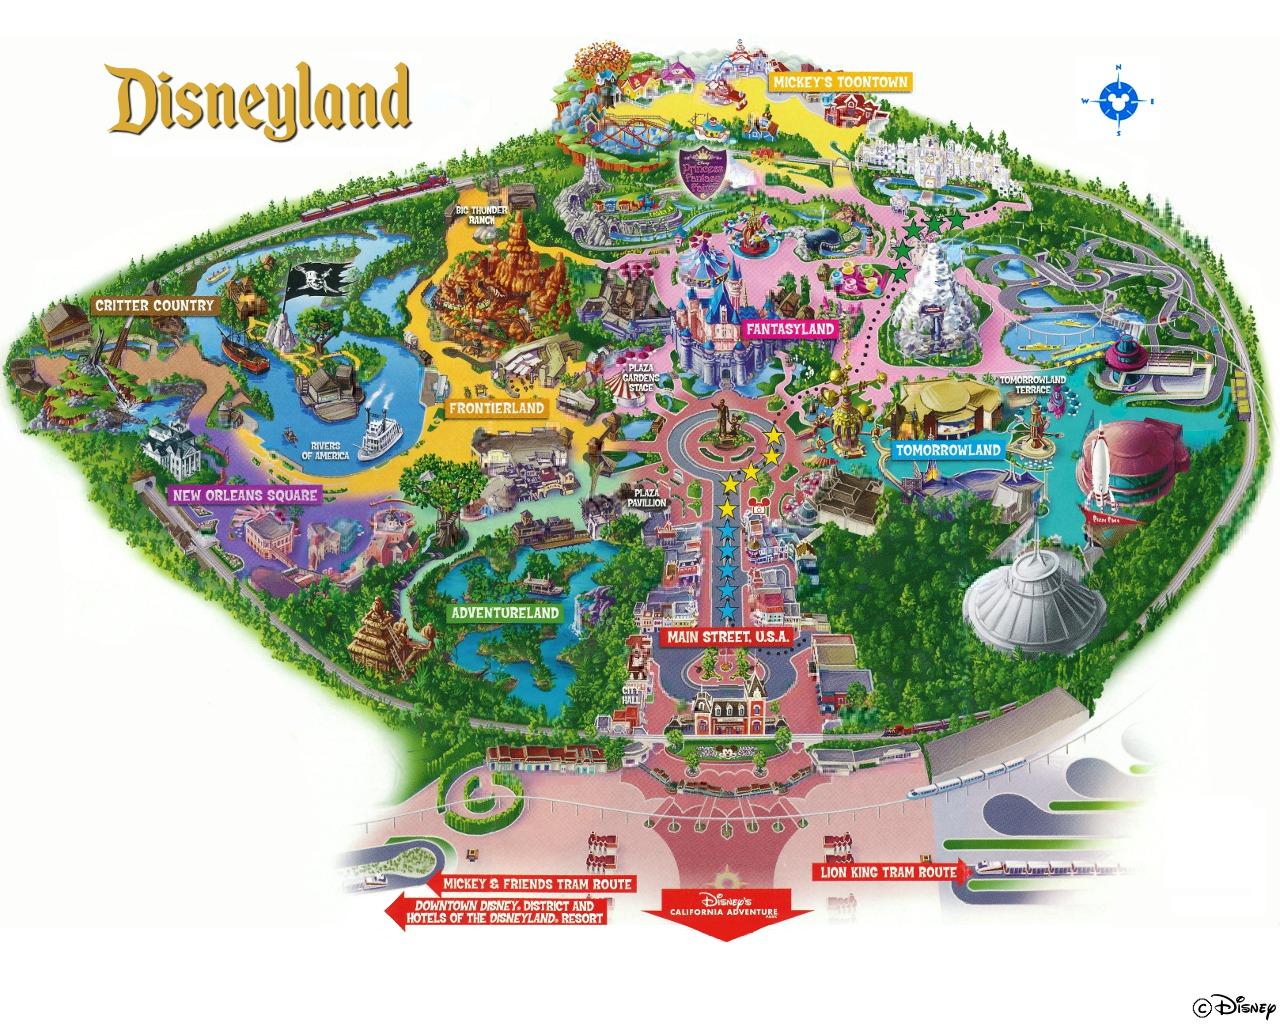 mapa disneyland paris 2011 Map Of Disney | My blog mapa disneyland paris 2011